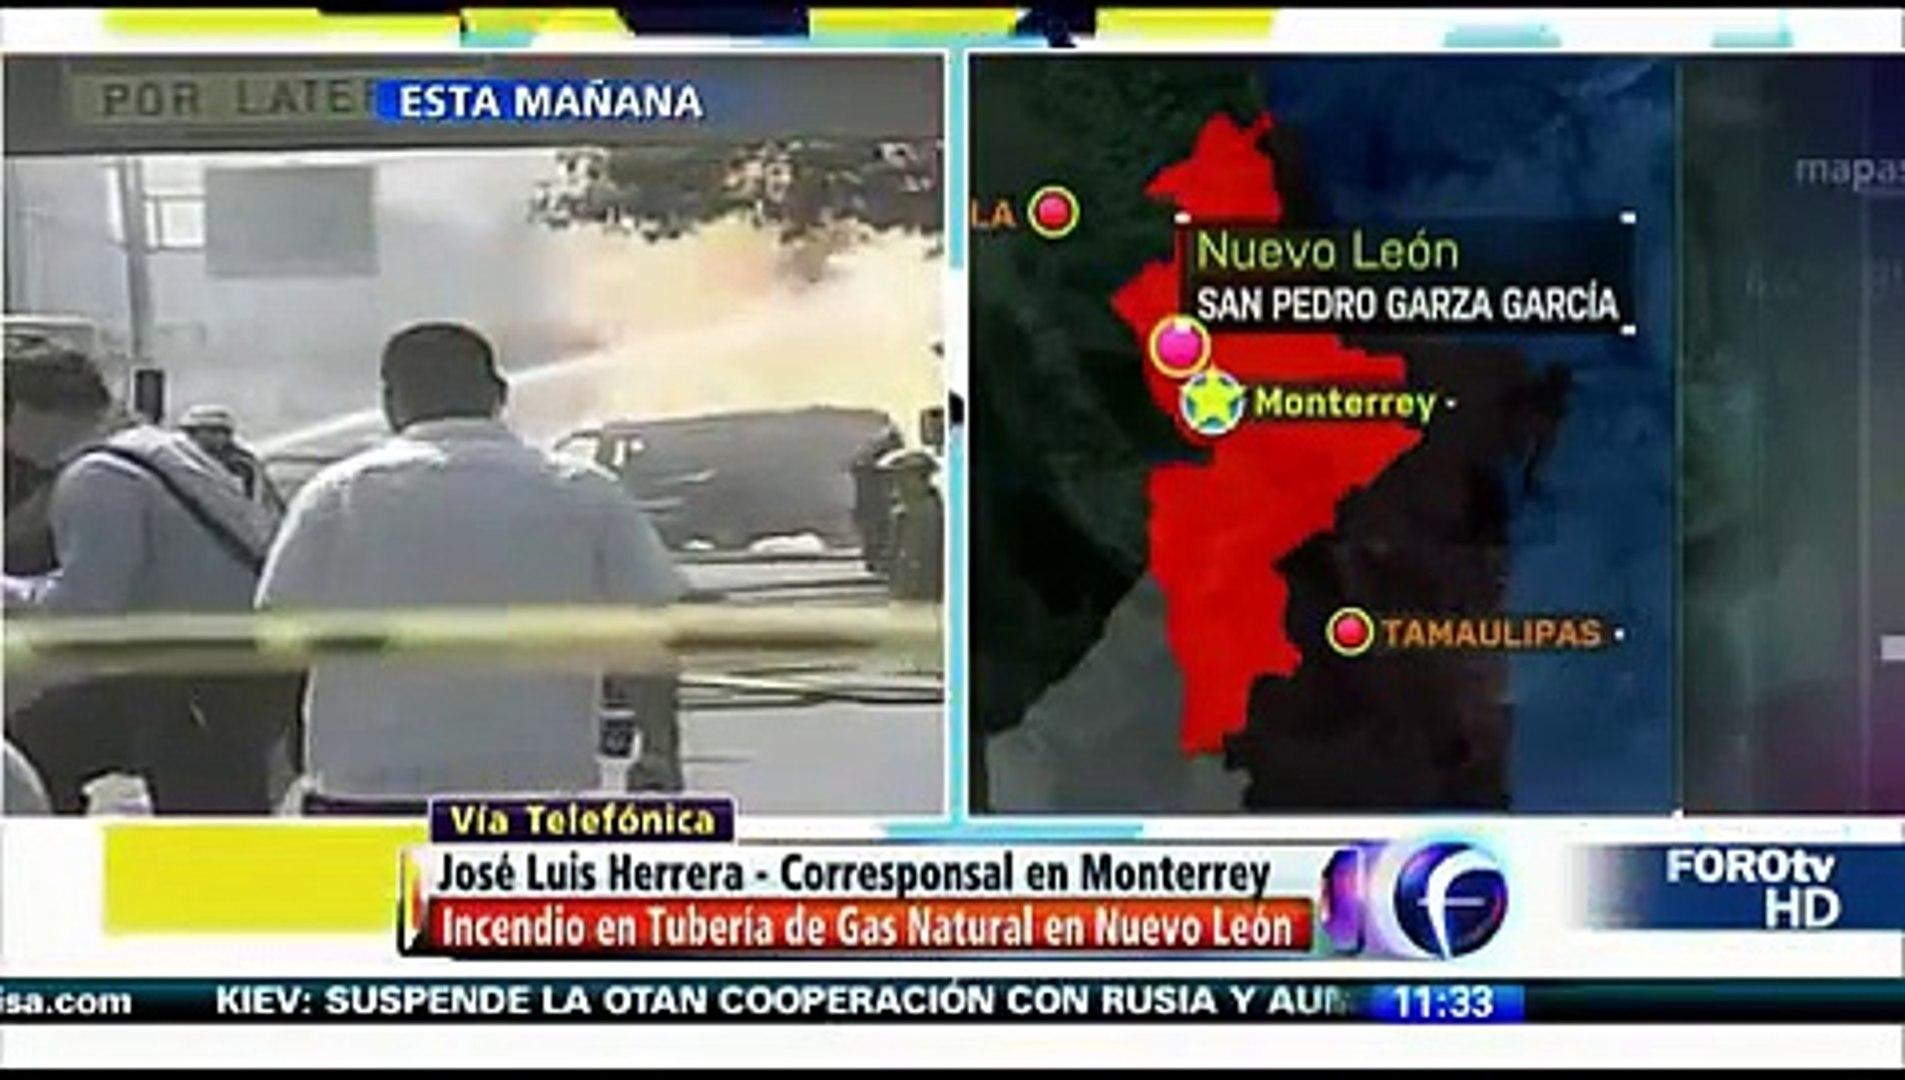 Explosión e incendio en tubería de gas natural en San Pedro Garza Garcia 7 agosto 014 Nuevo León